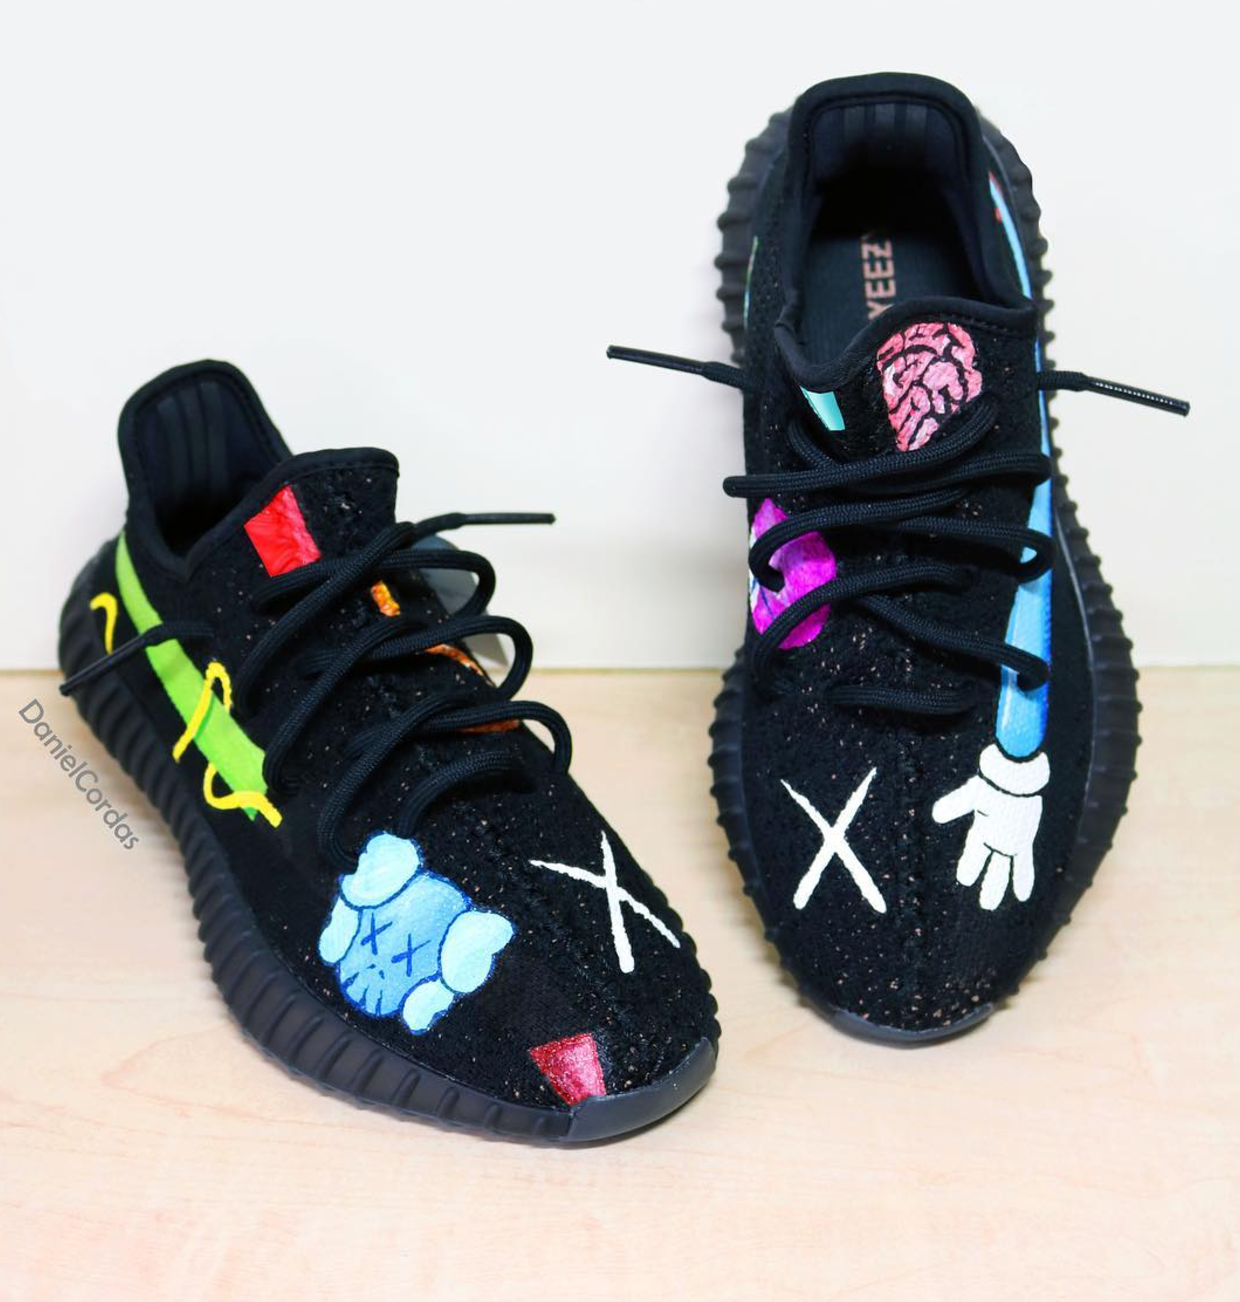 sports shoes 6531b 5da67 EU - Kaws x adidas Yeezy Boost 350 V2 Custom